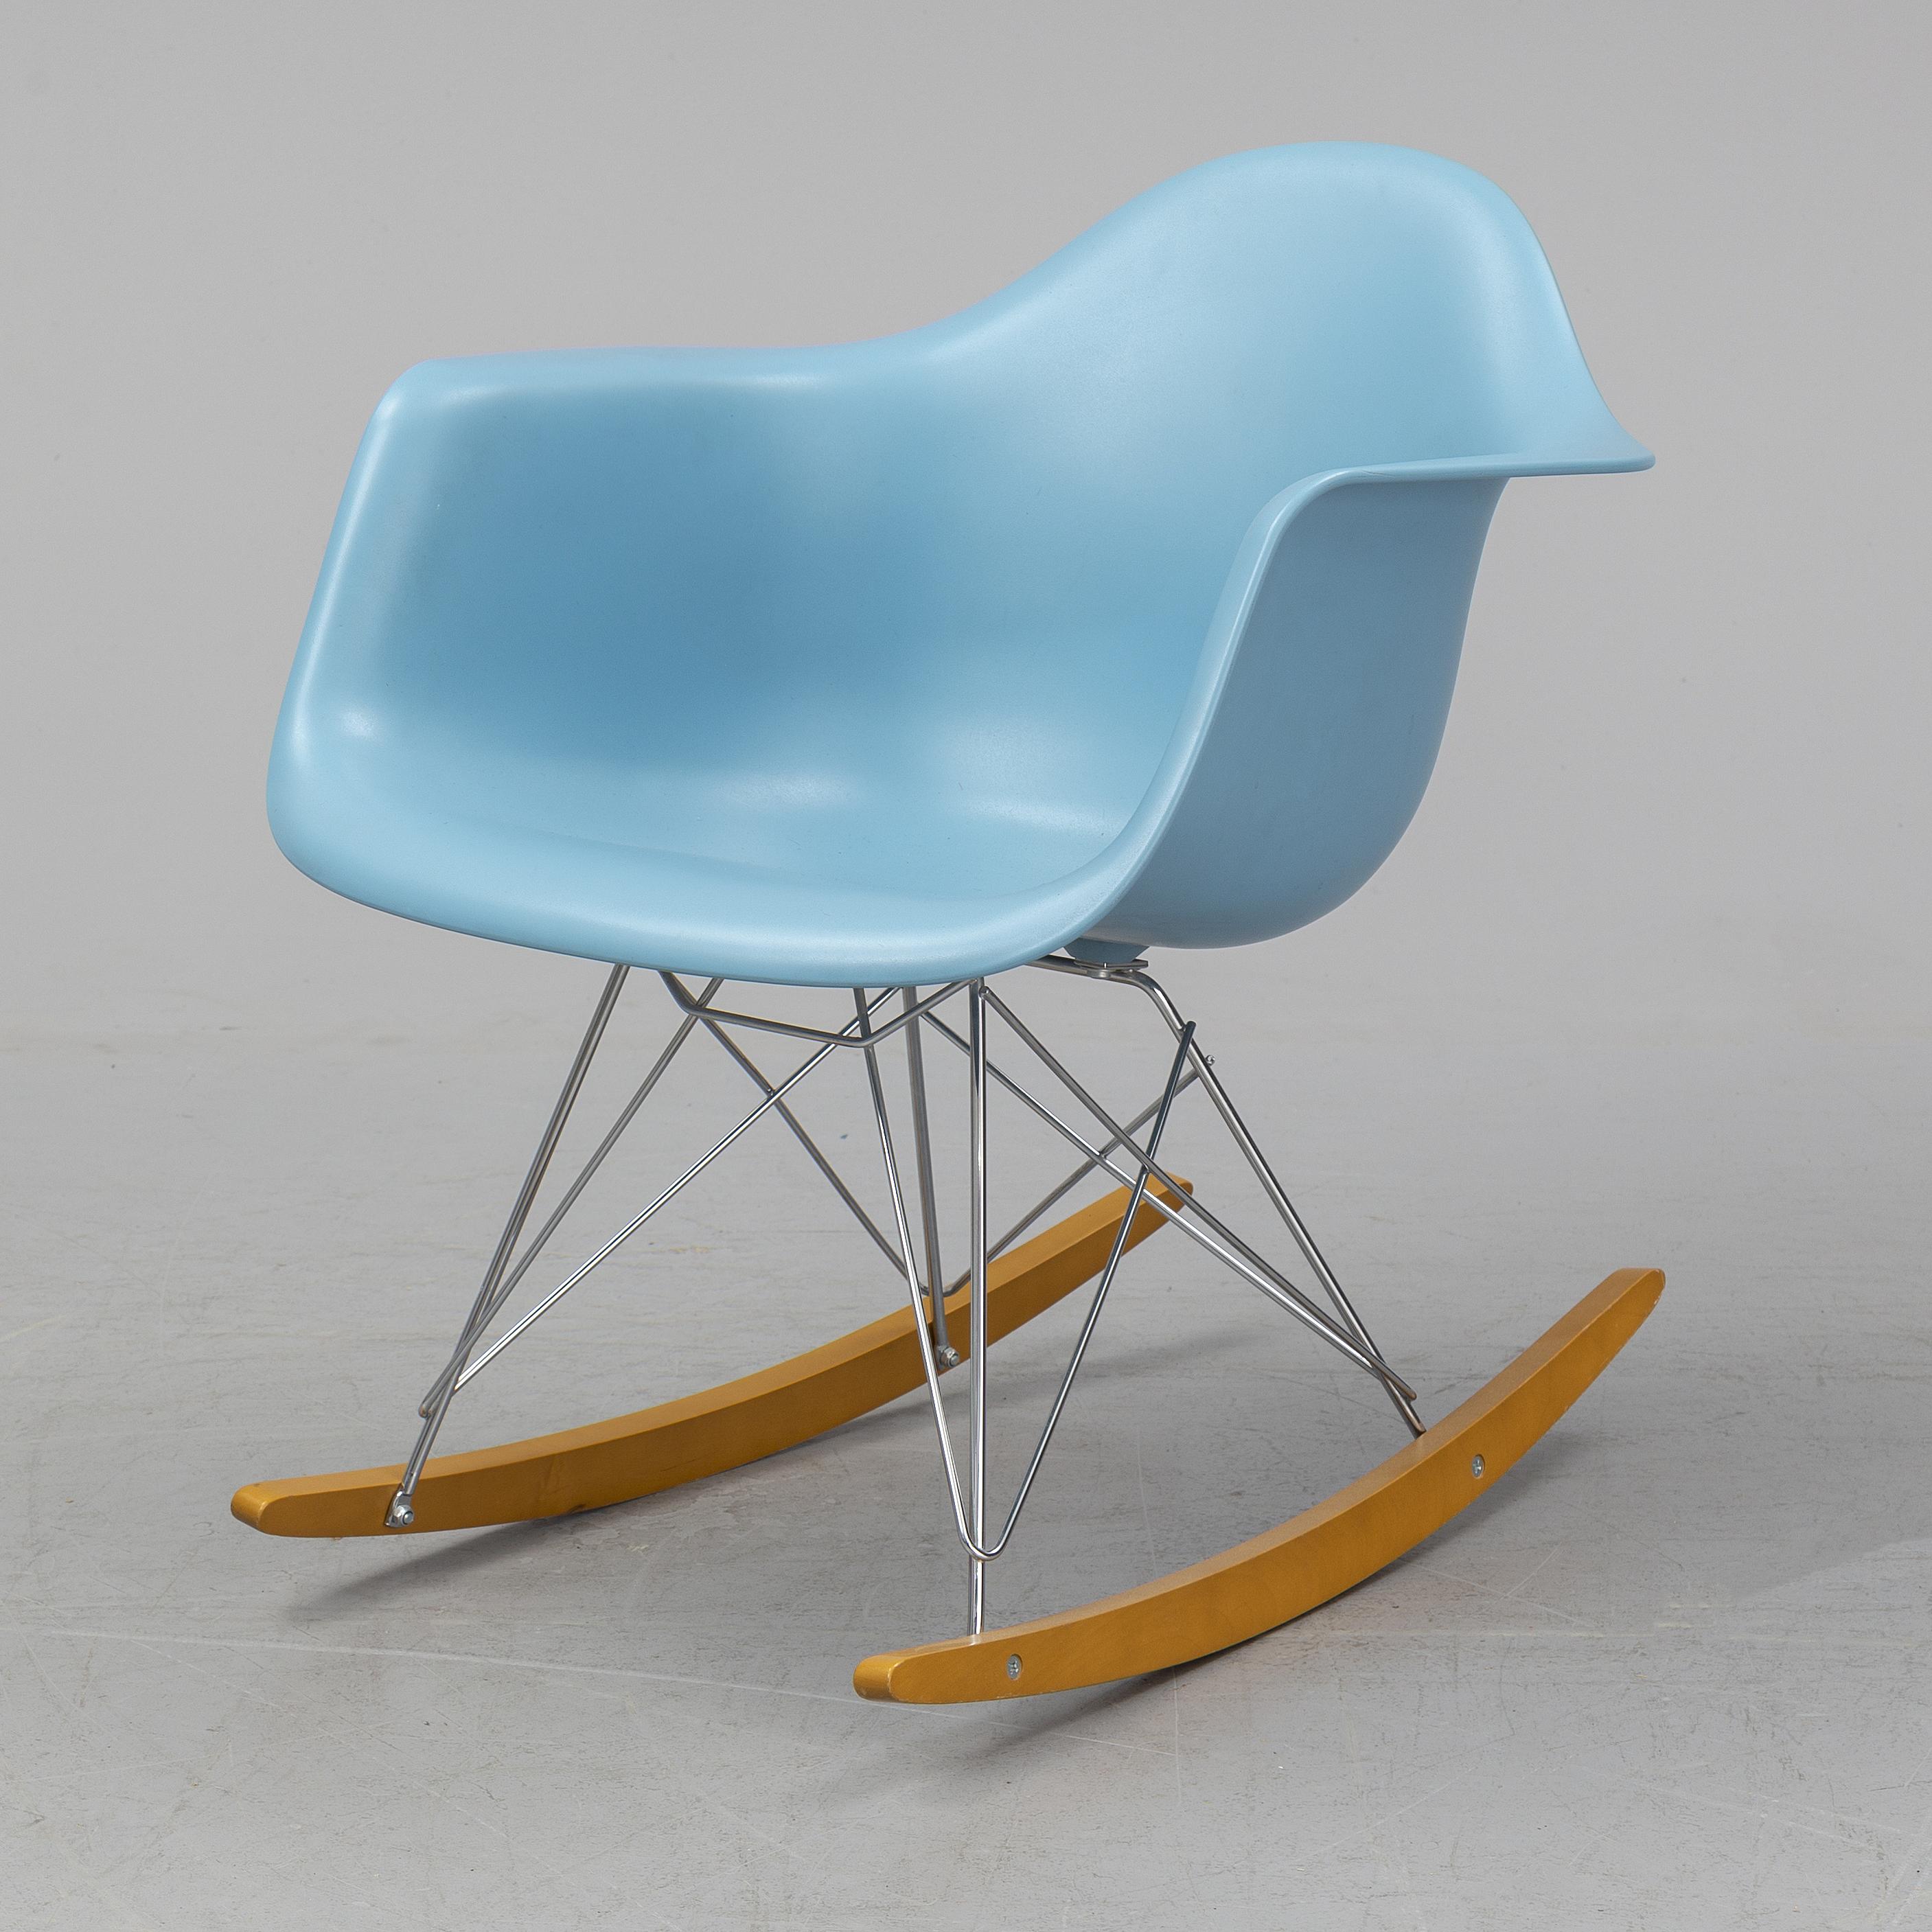 Marvelous Charles Ray Eames A Rar Rocking Chair From Vitra 2009 Inzonedesignstudio Interior Chair Design Inzonedesignstudiocom